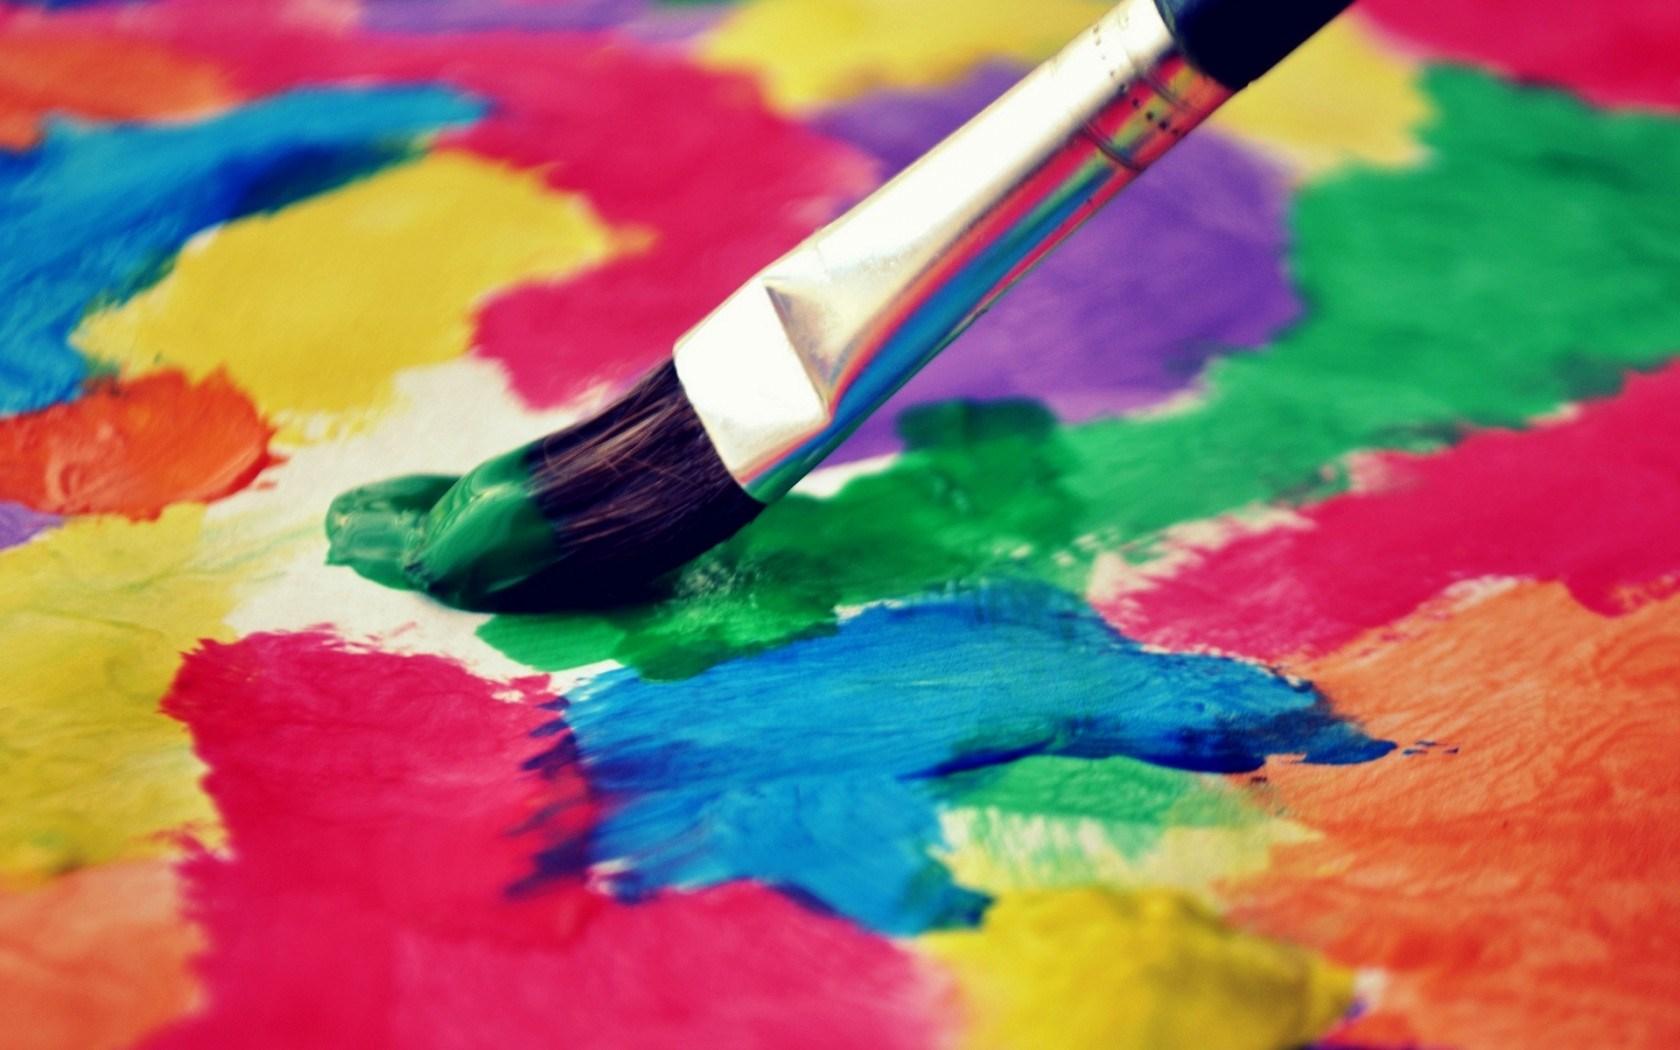 mood-brush-paint-color-hd-wallpaper